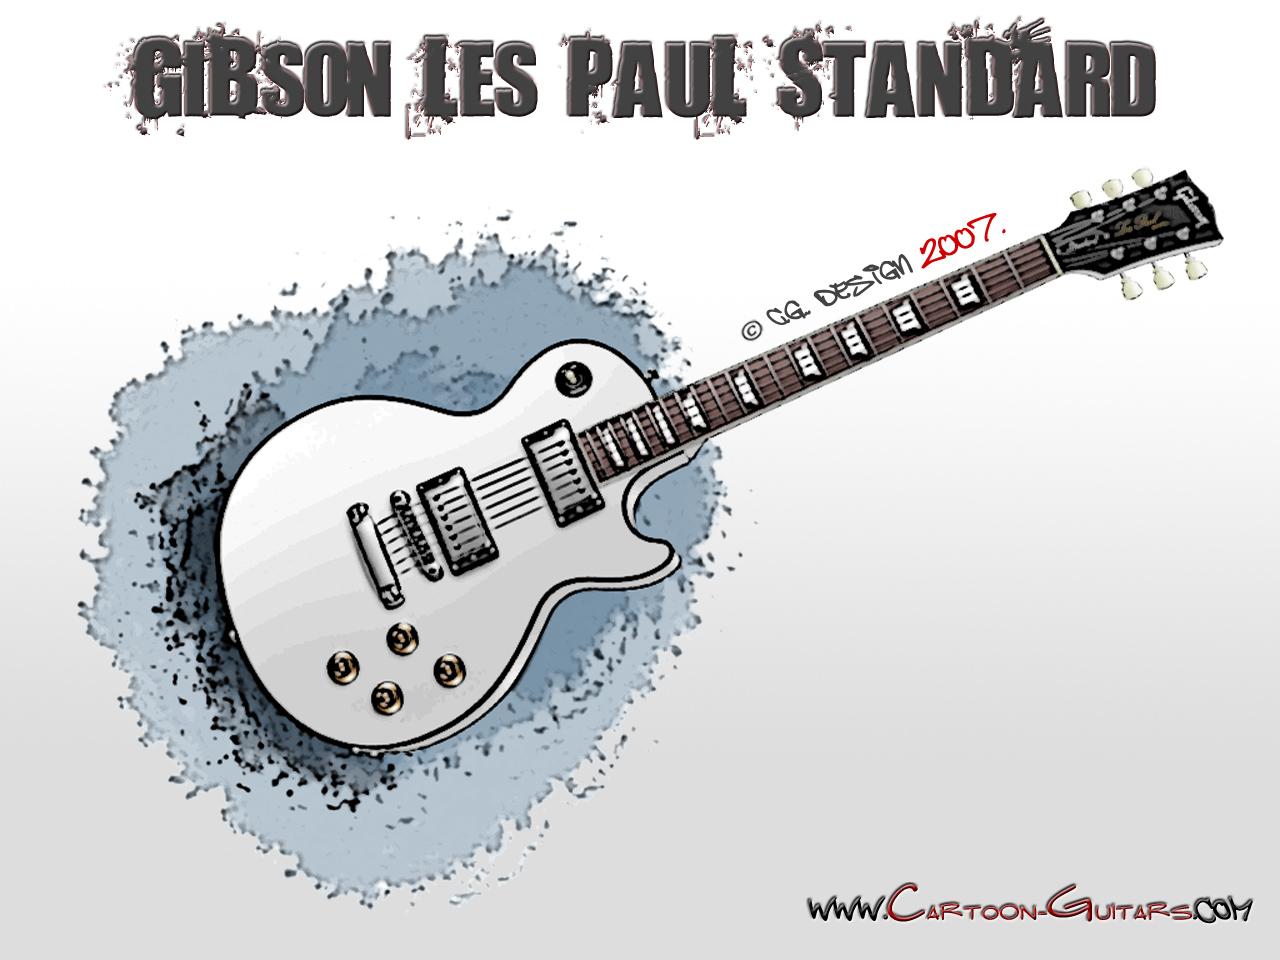 Drawn guitar gibson guitar Gallery guitar WALLPAPERS GIBSON wallpaper